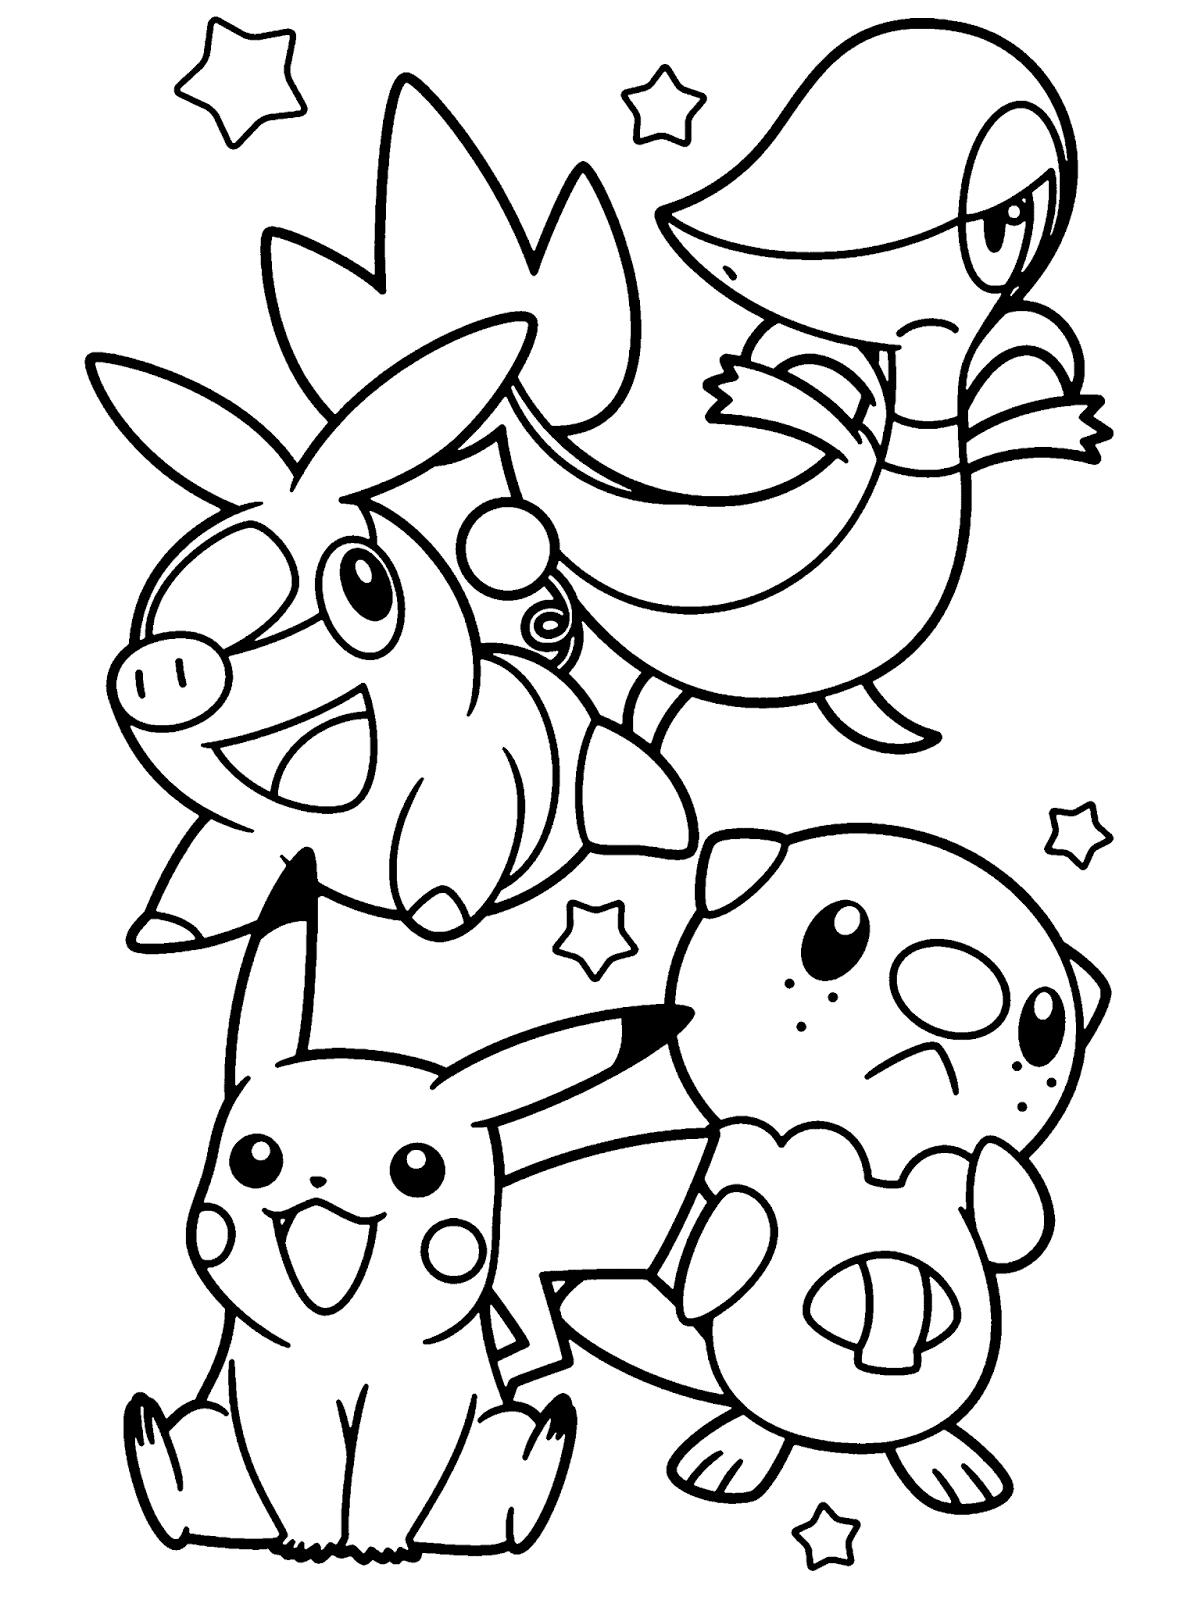 50 desenhos de Pokemon para colorir, pintar, imprimir ...